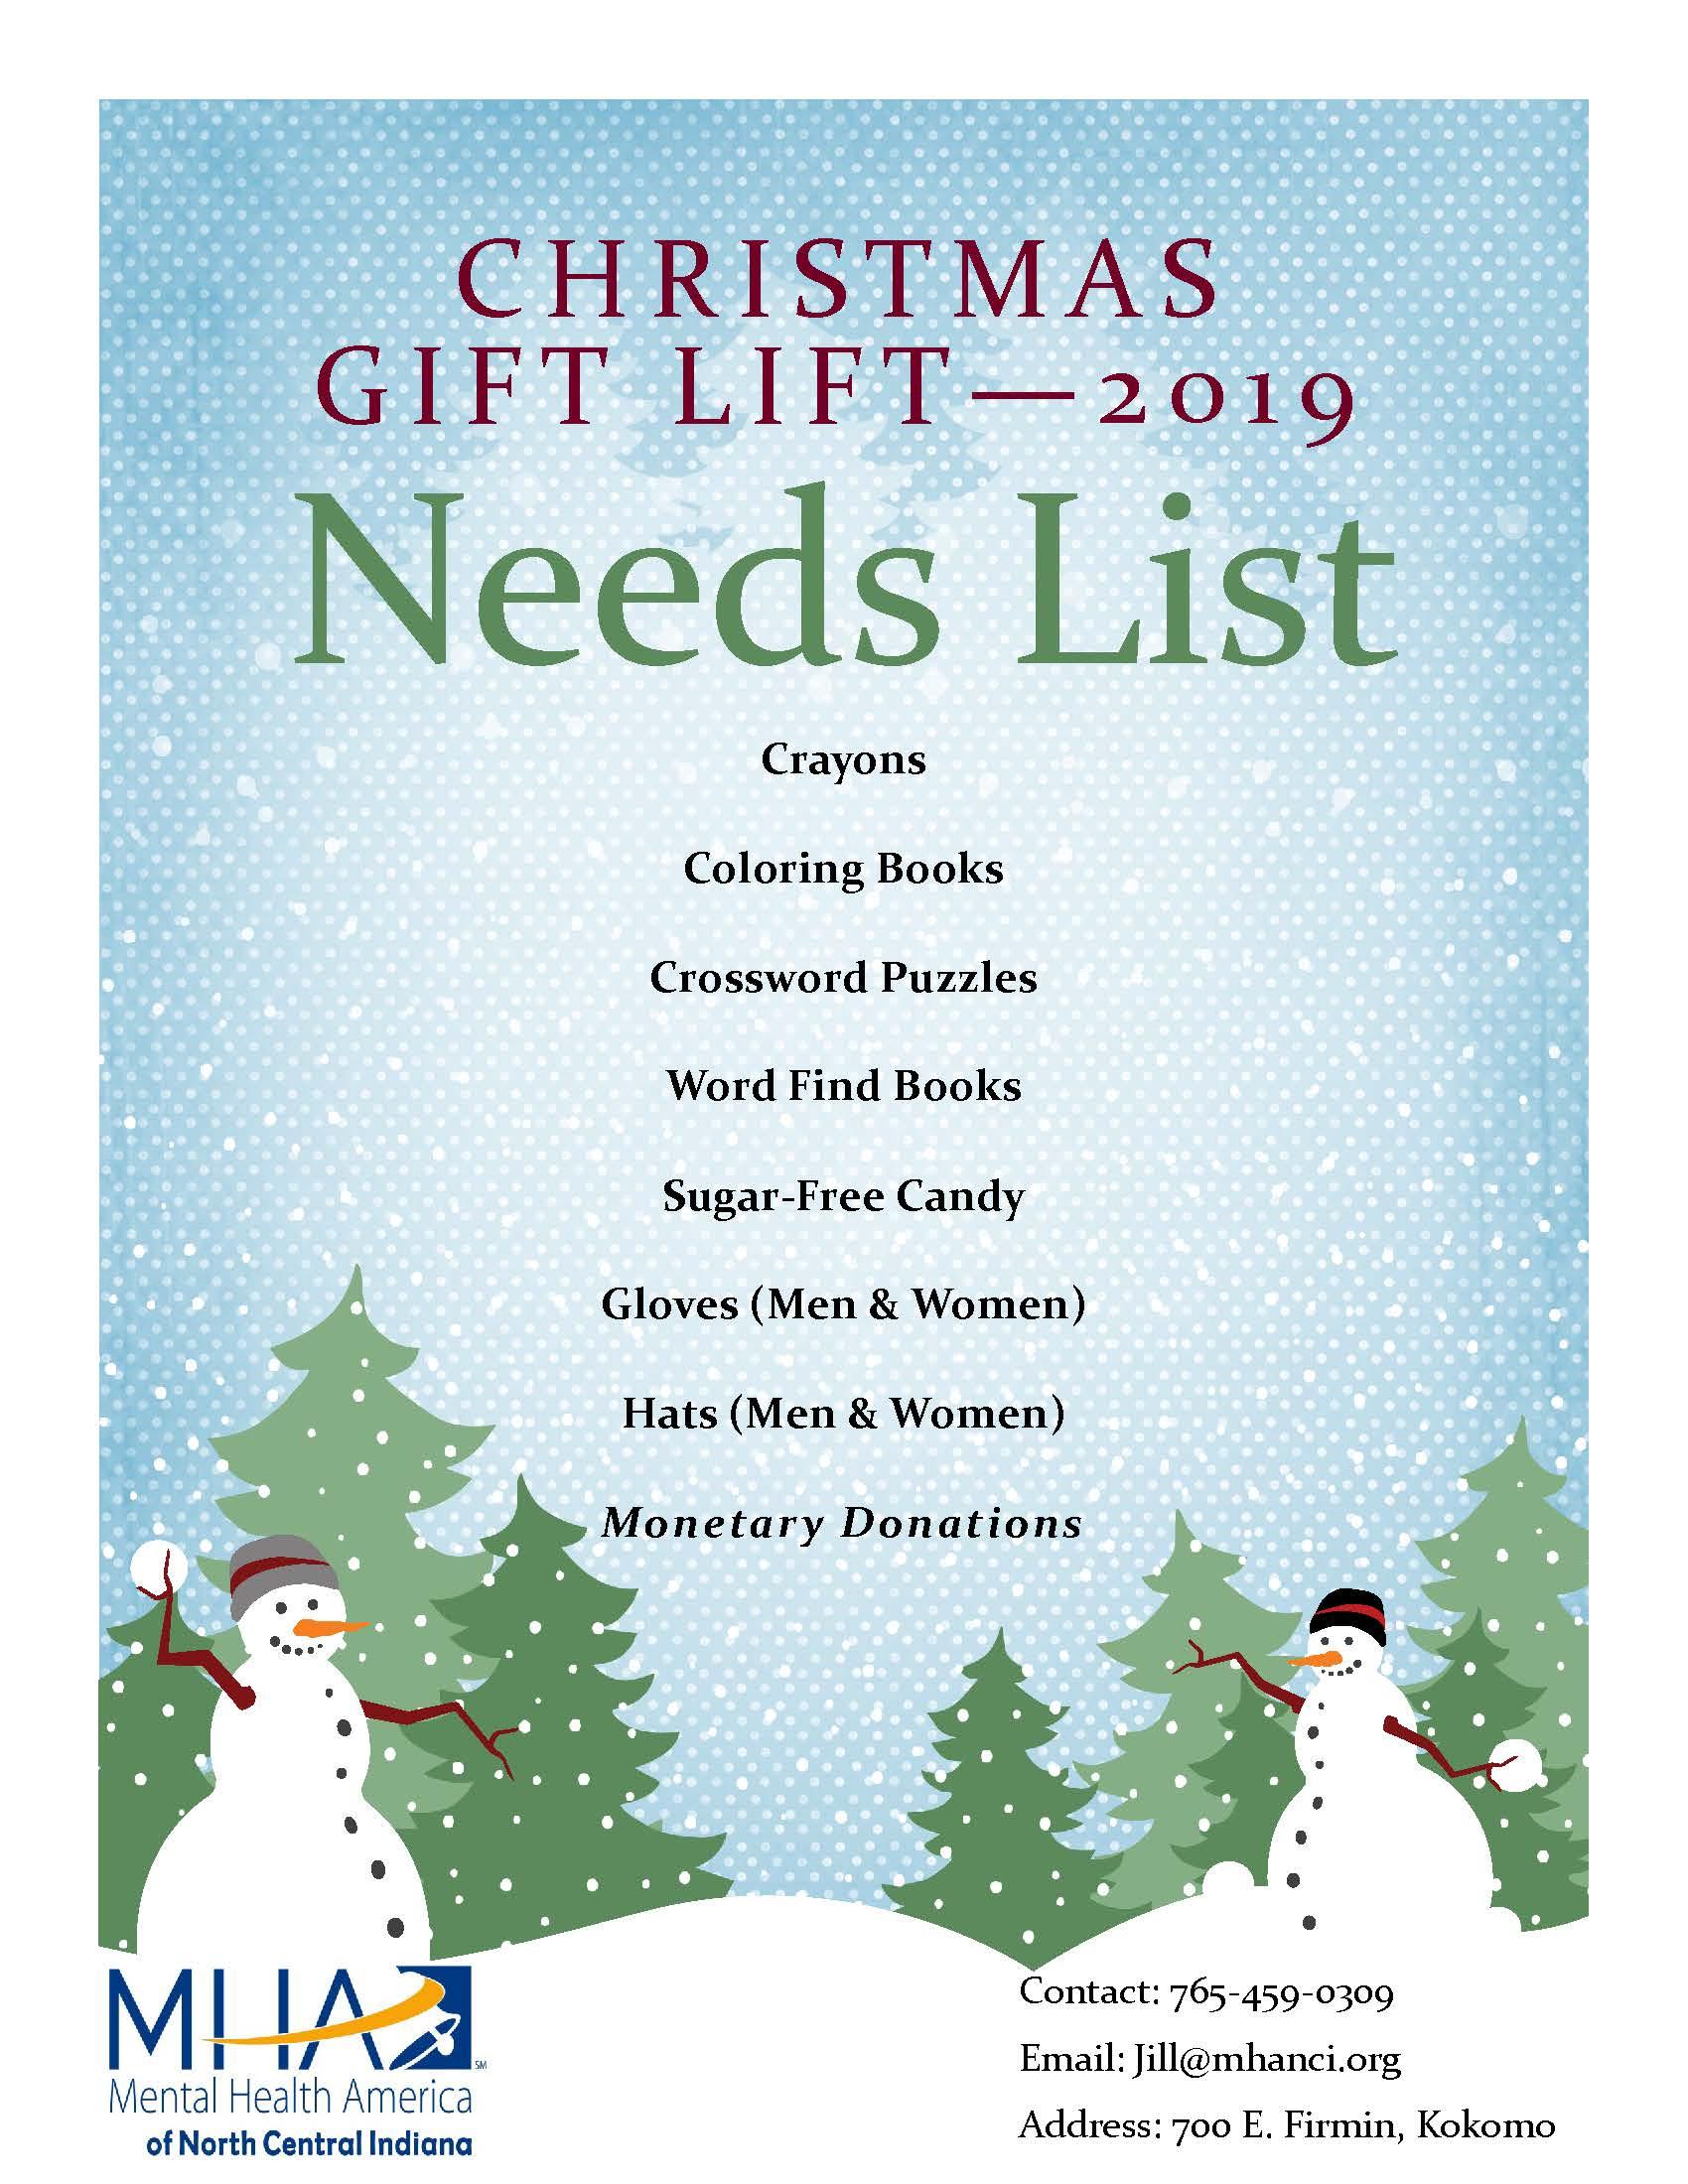 Gift Lift Needs List - 2019